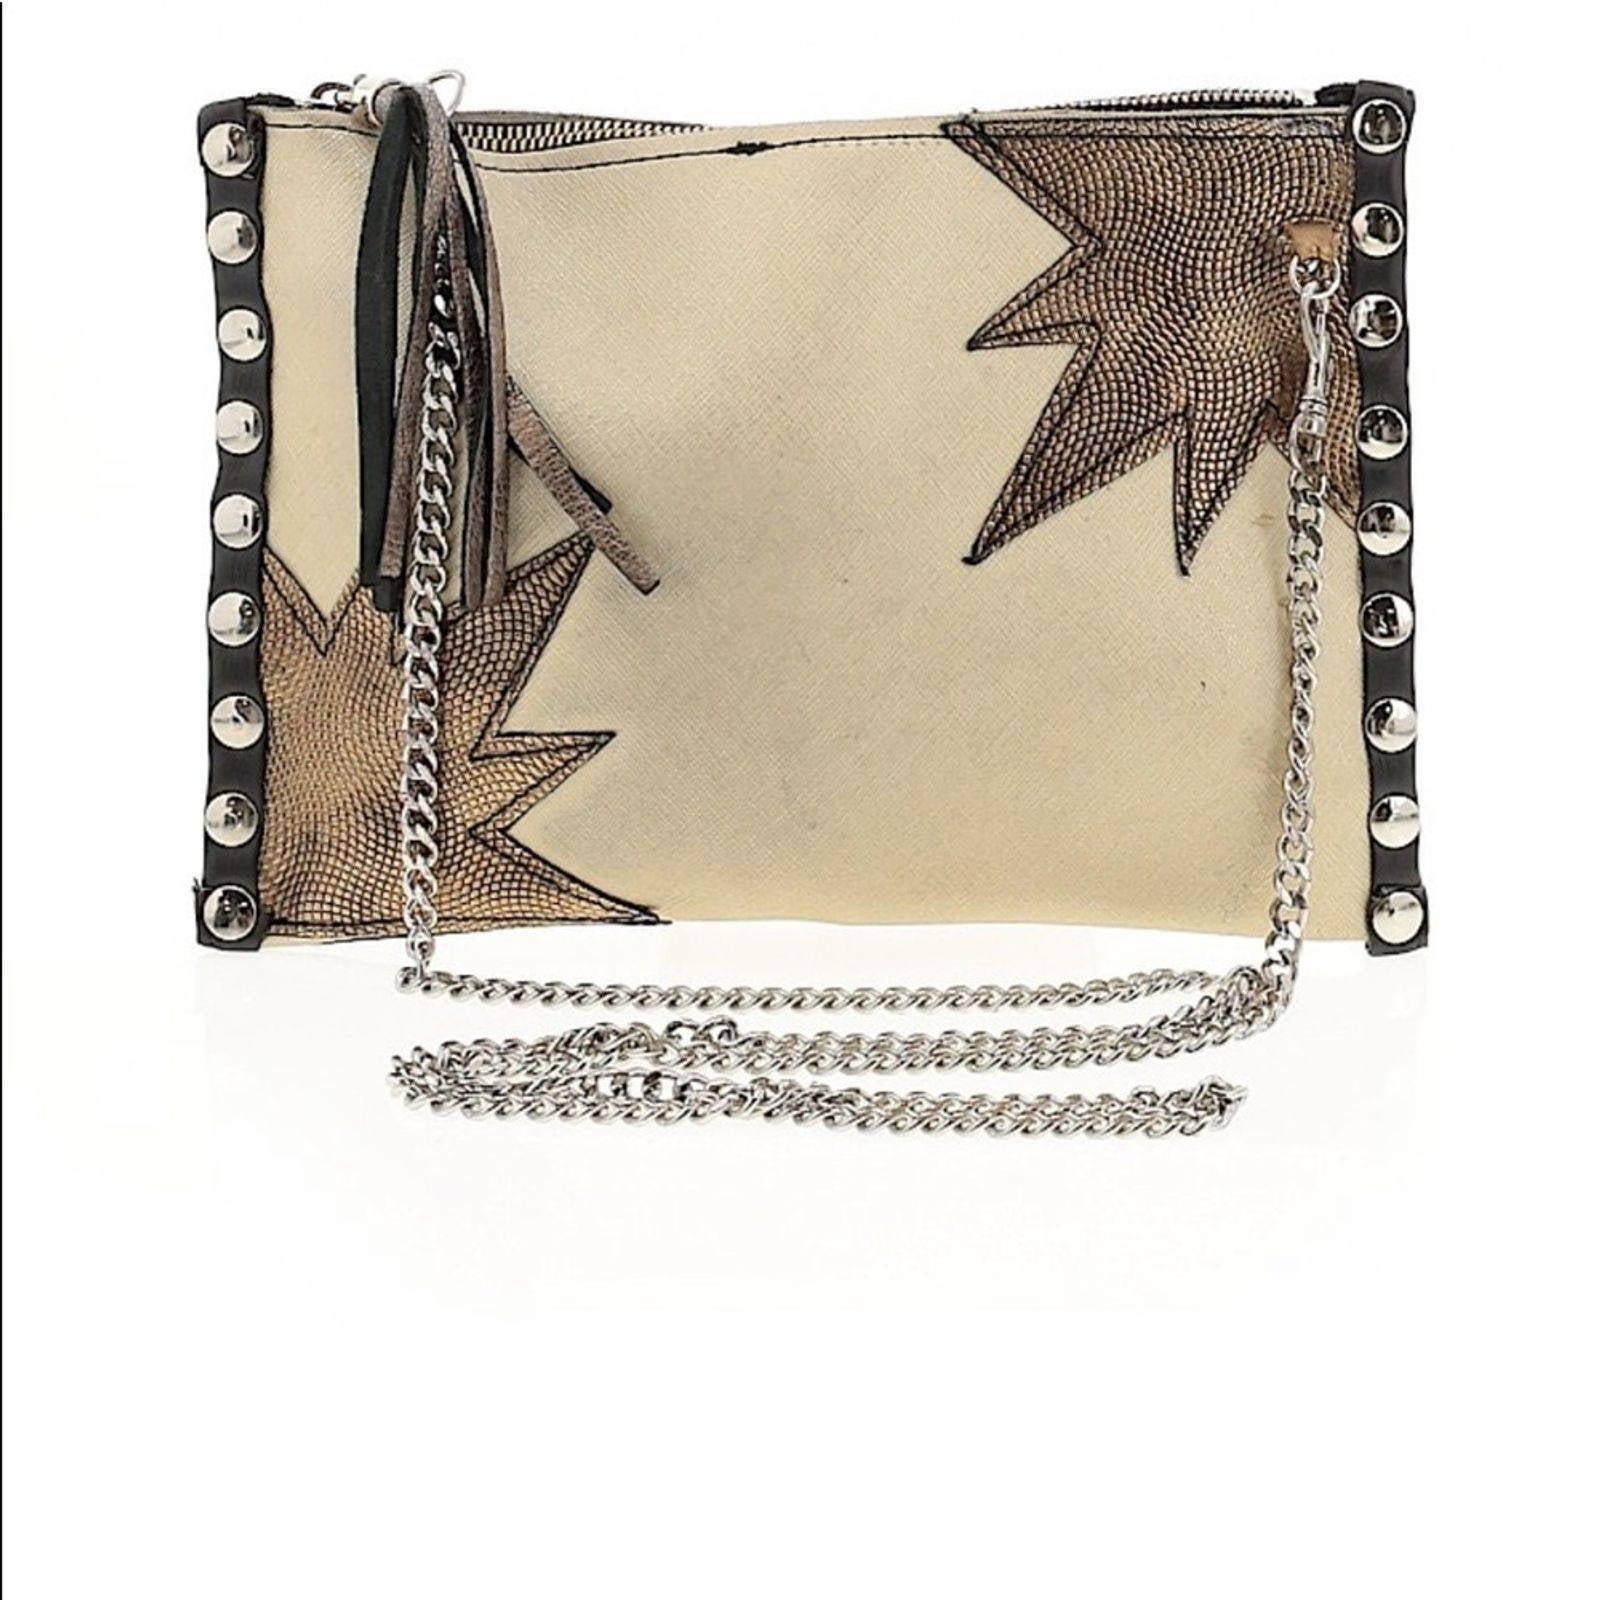 Anthropologie Leather crossbody bag